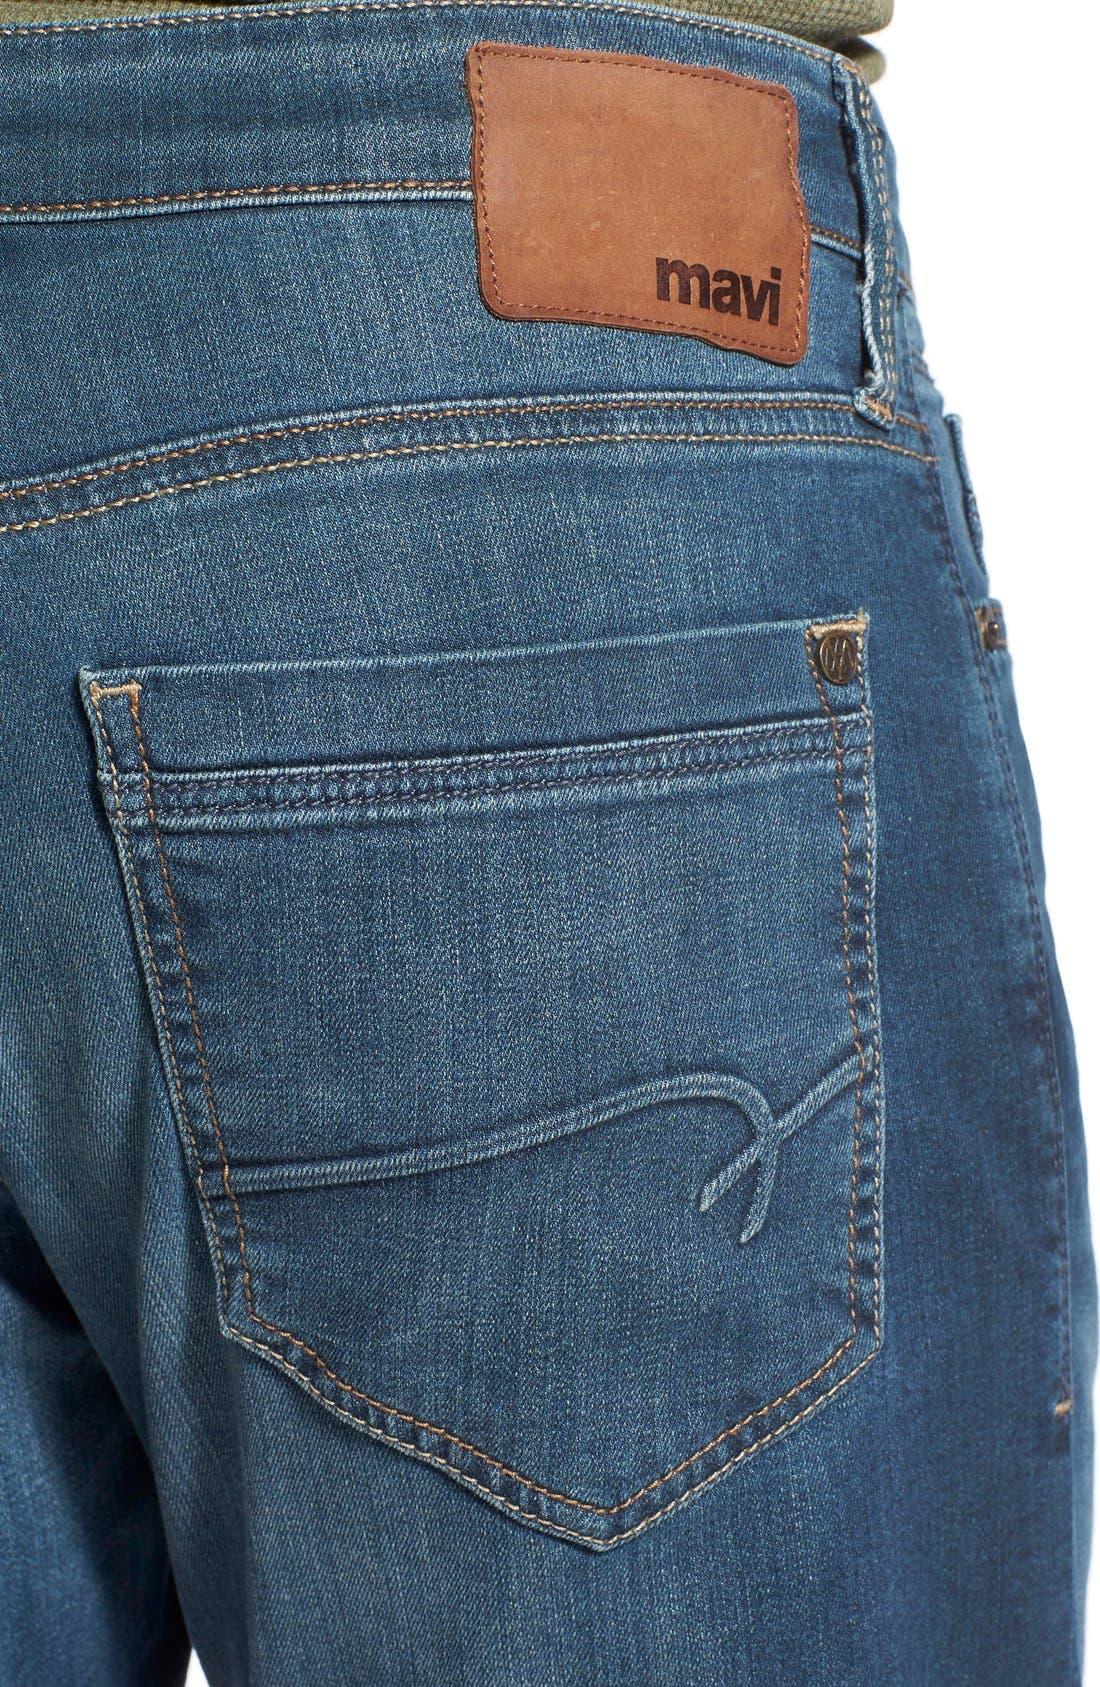 Myles Straight Leg Jeans,                             Alternate thumbnail 5, color,                             SHADED WILLIAMSBURG